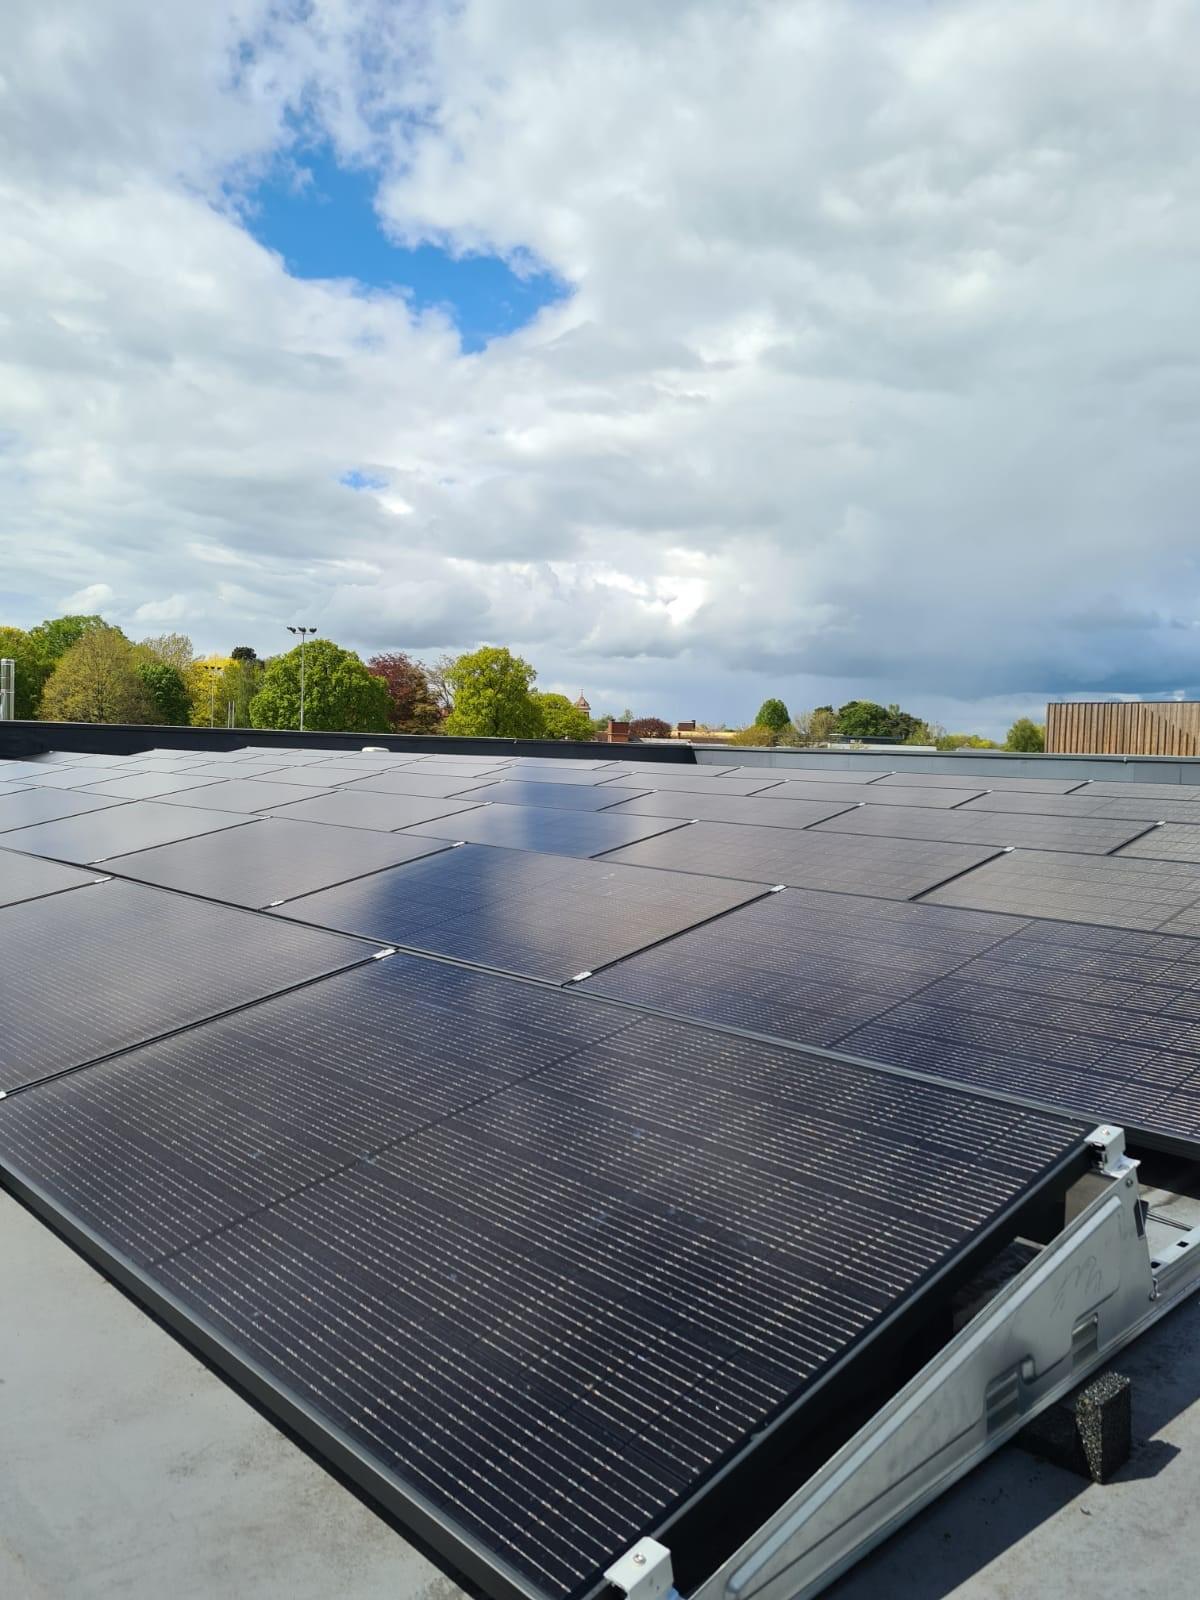 Reaseheath Vertical Farm Solar Power